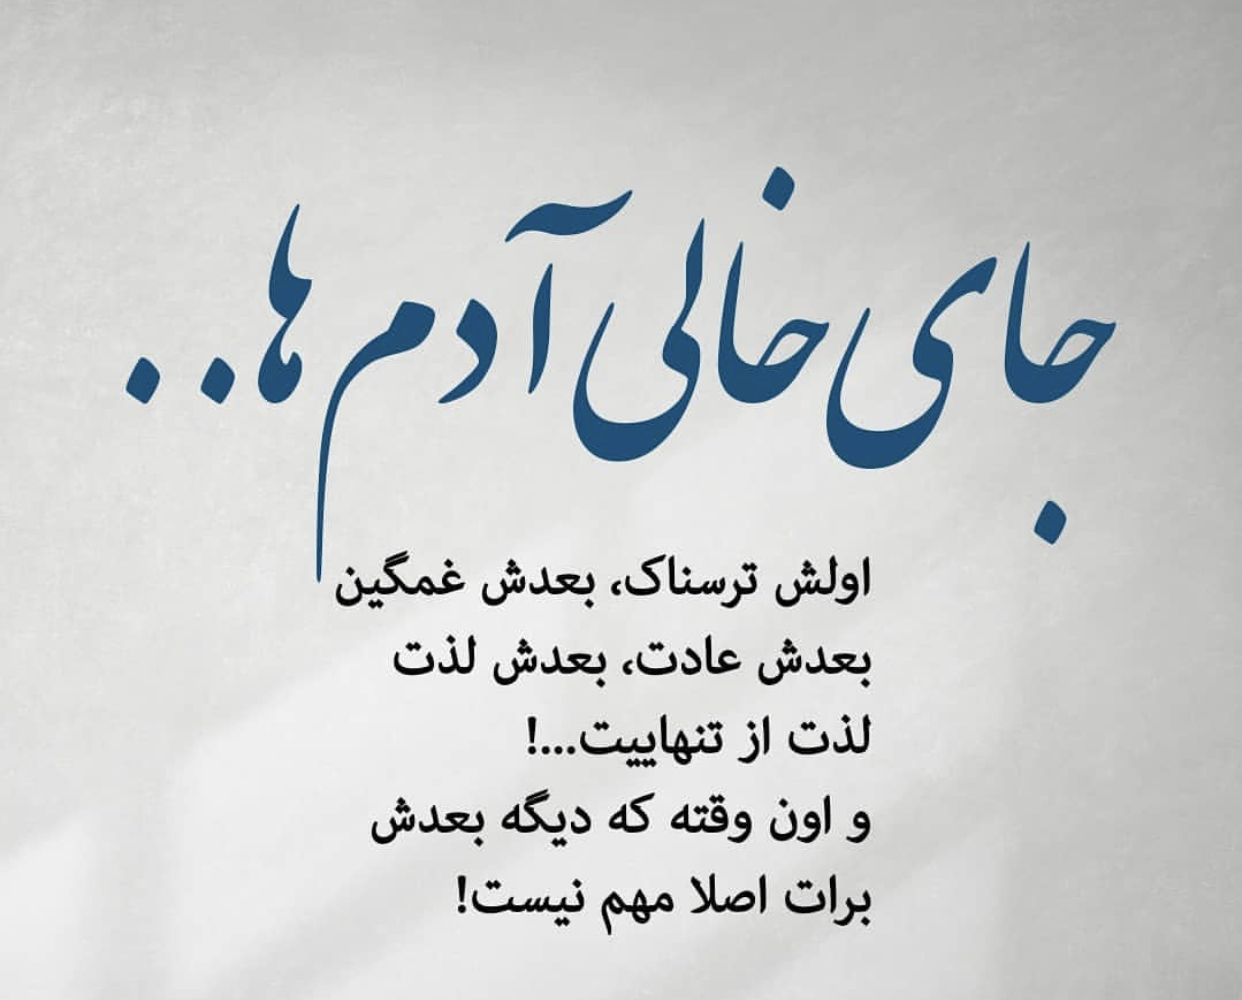 Photo of سخنان زیبا و حکیمانه از بزرگان + عکس نوشته پروفایل سخنان زیبا